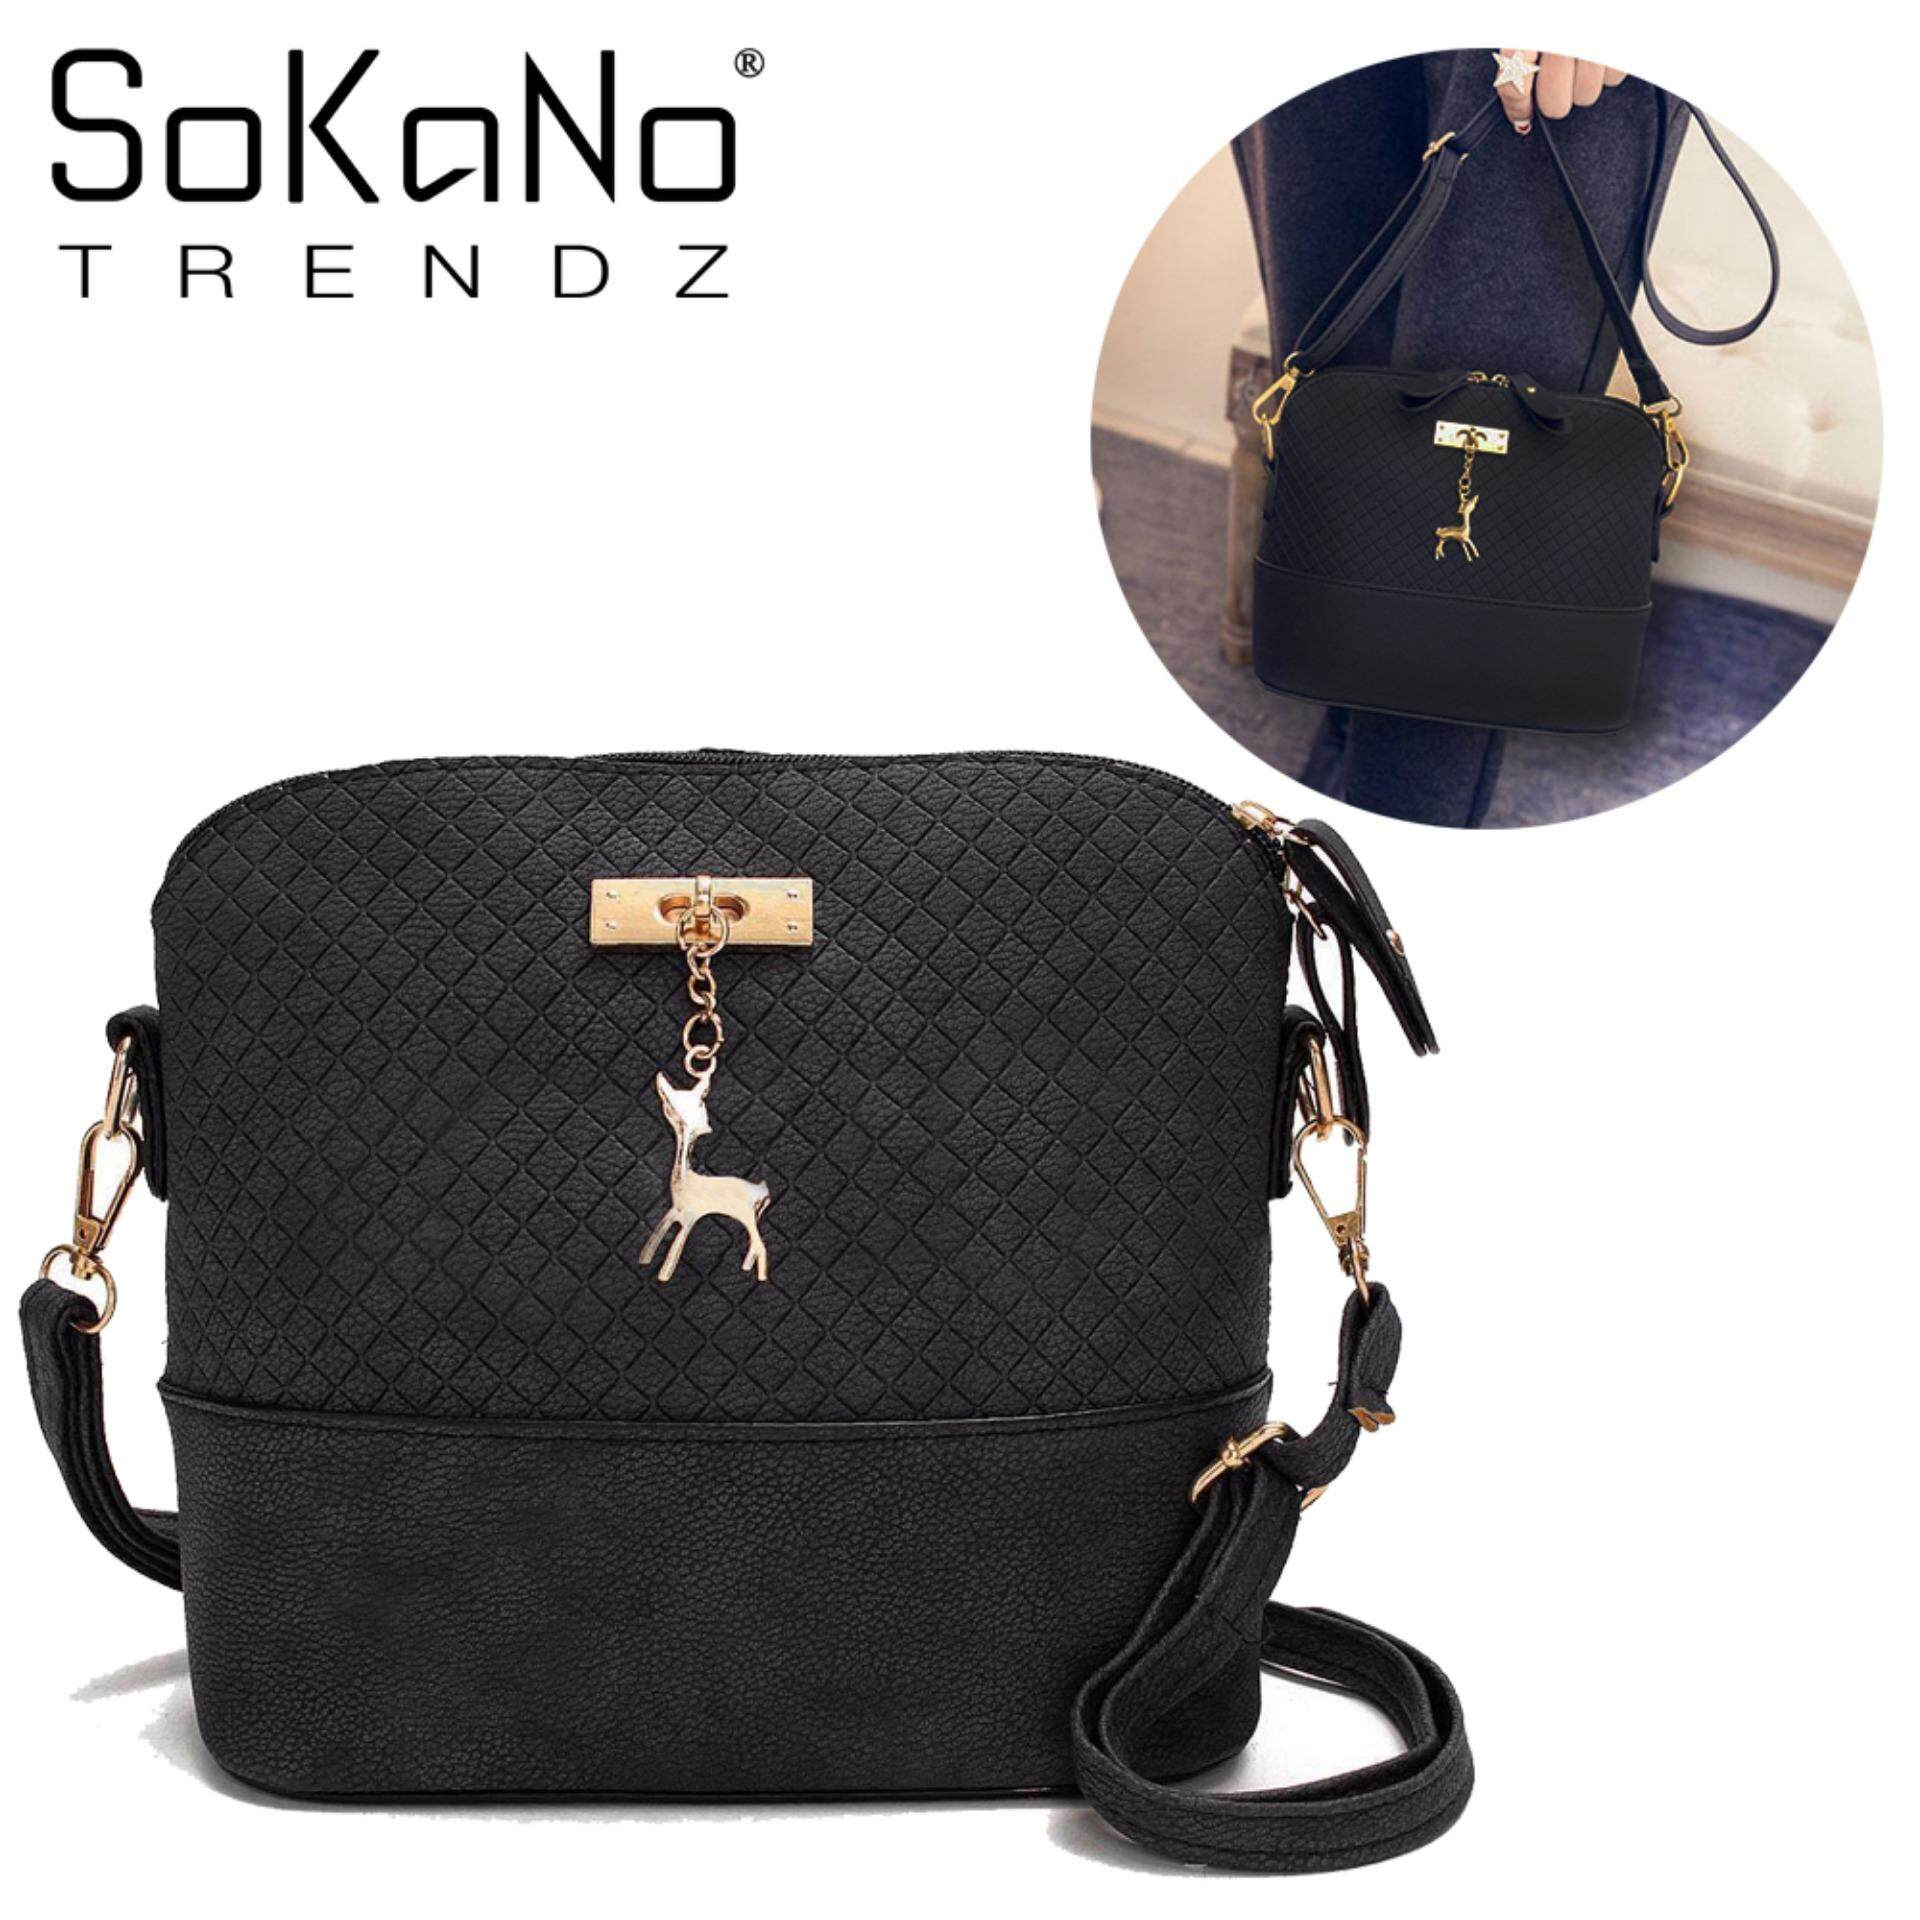 ... Charm Handbeg Wanita - Black · Sokano Trendz Skn619 Pu Leather  Crossbody Bag With Deer Char. f64687dd91